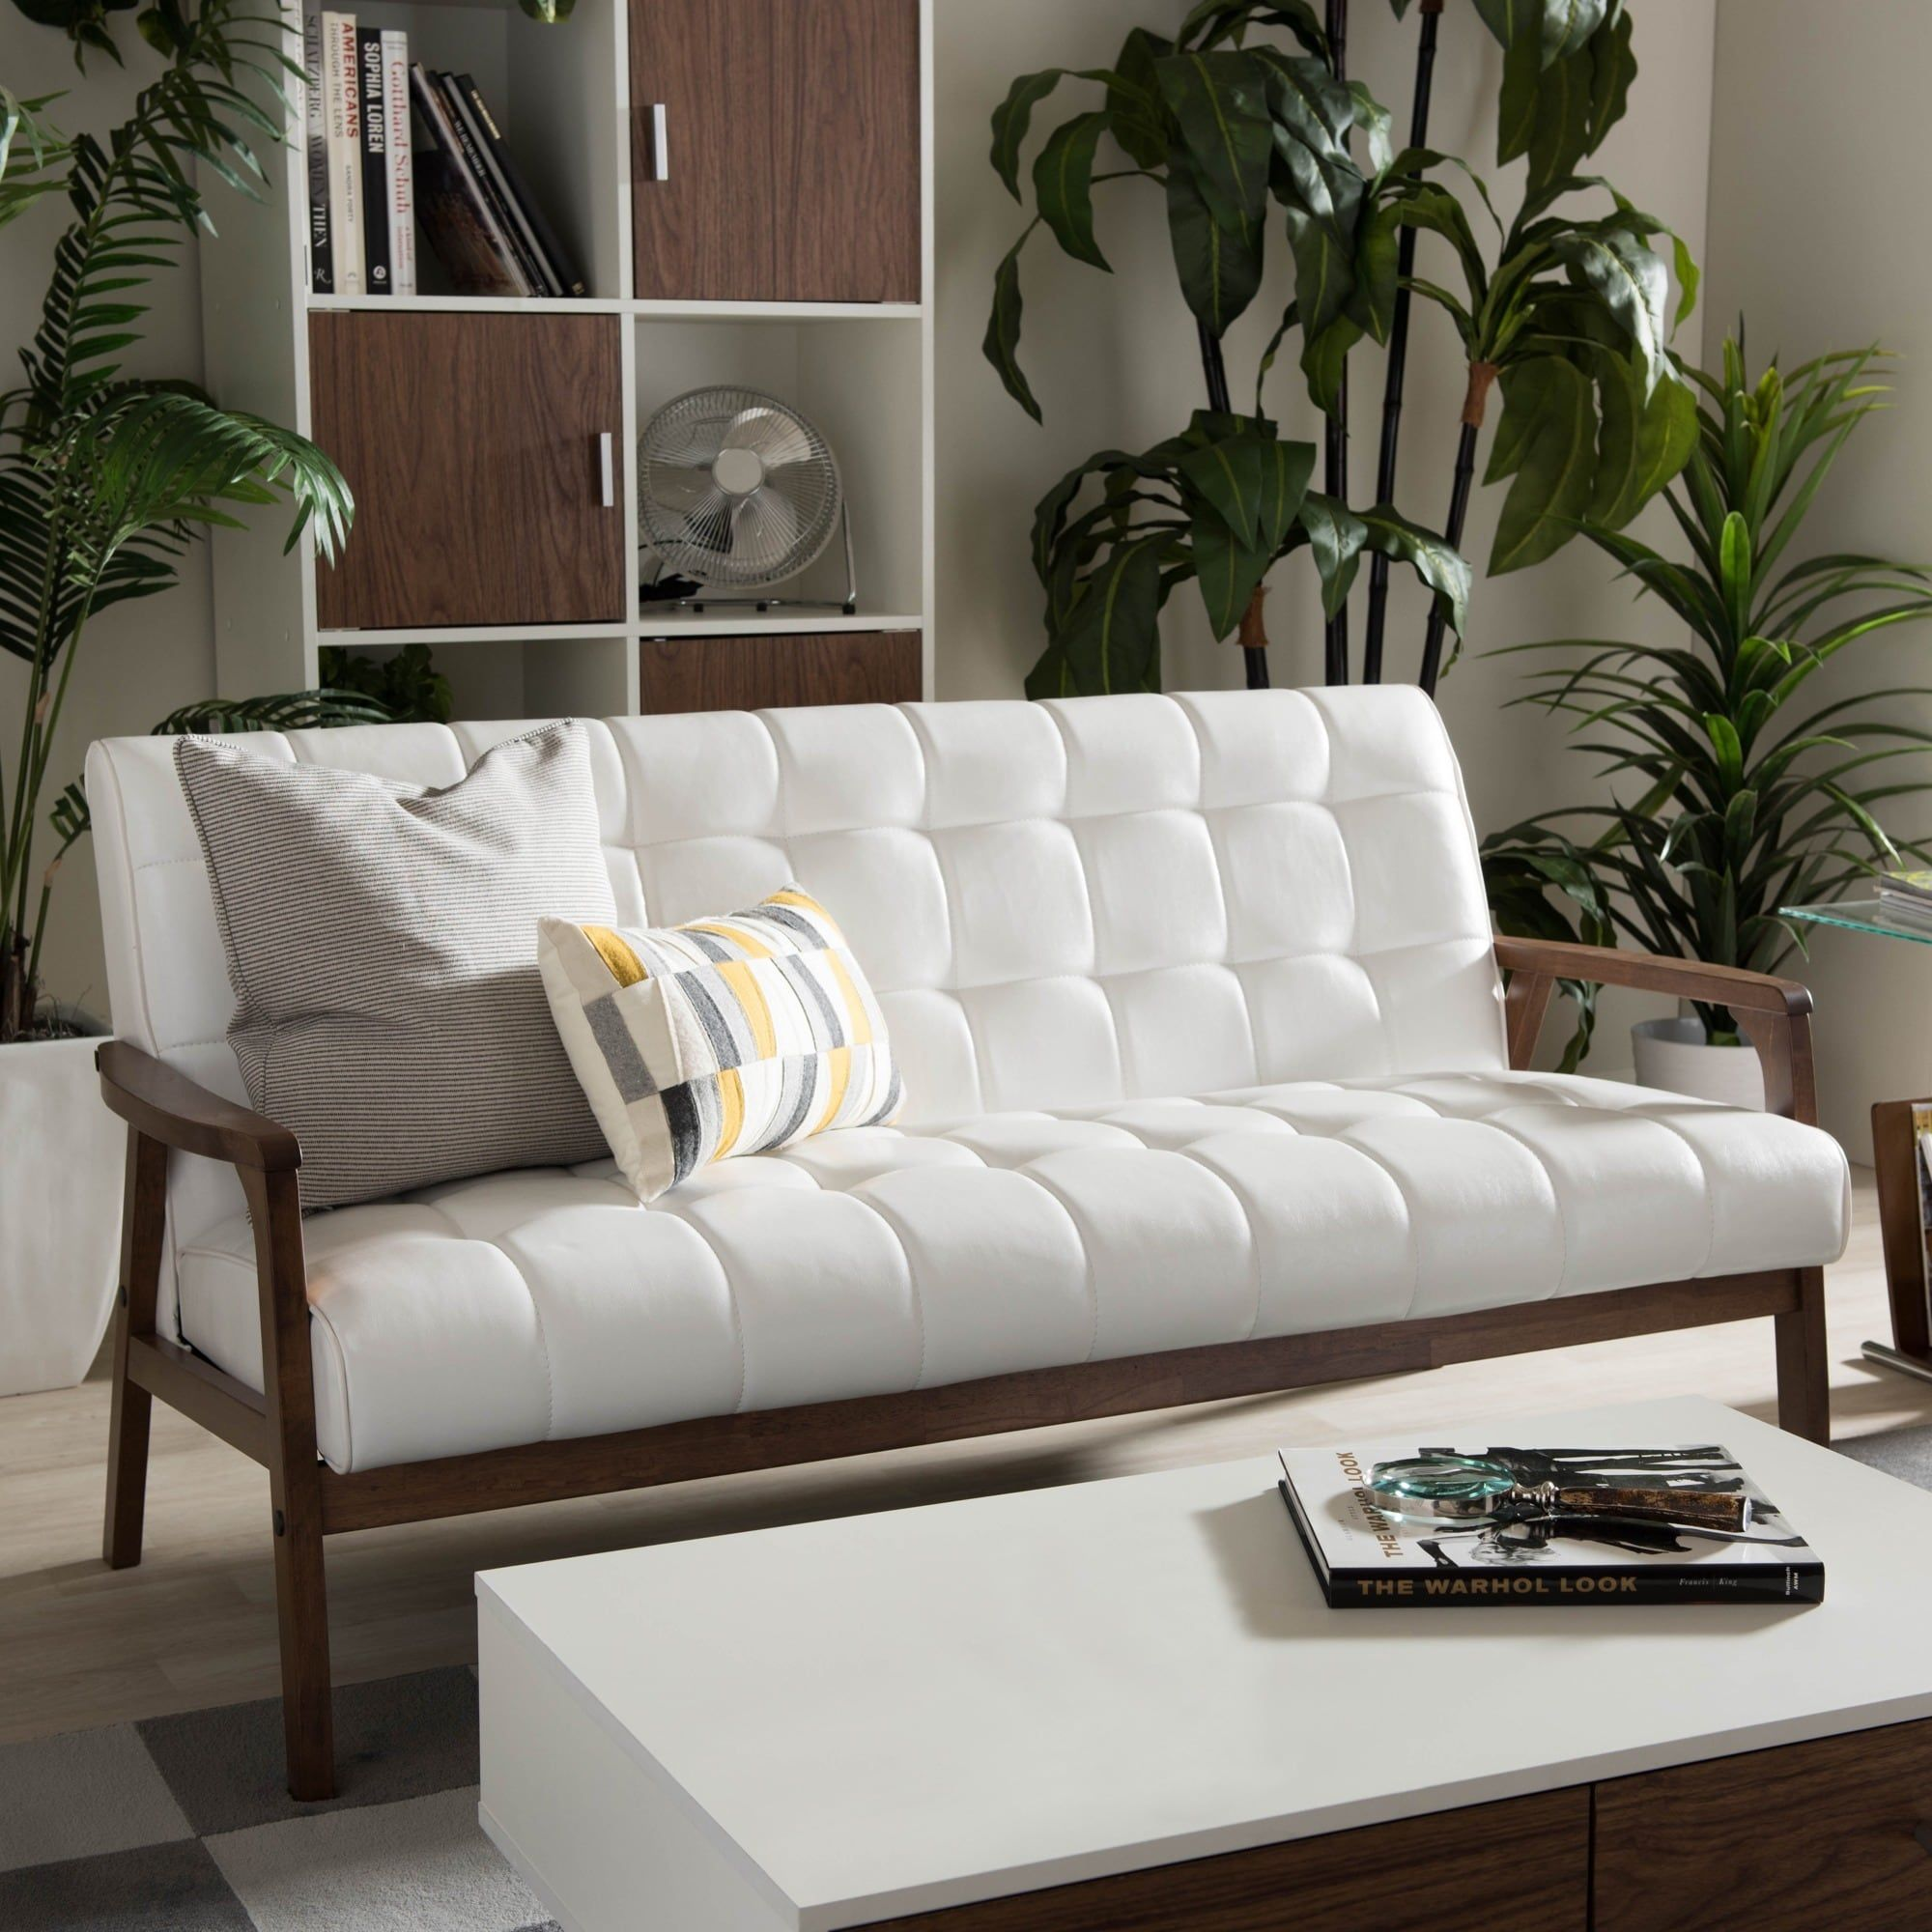 Fabb 3 Seater Sofa New Club sofas Pinterest